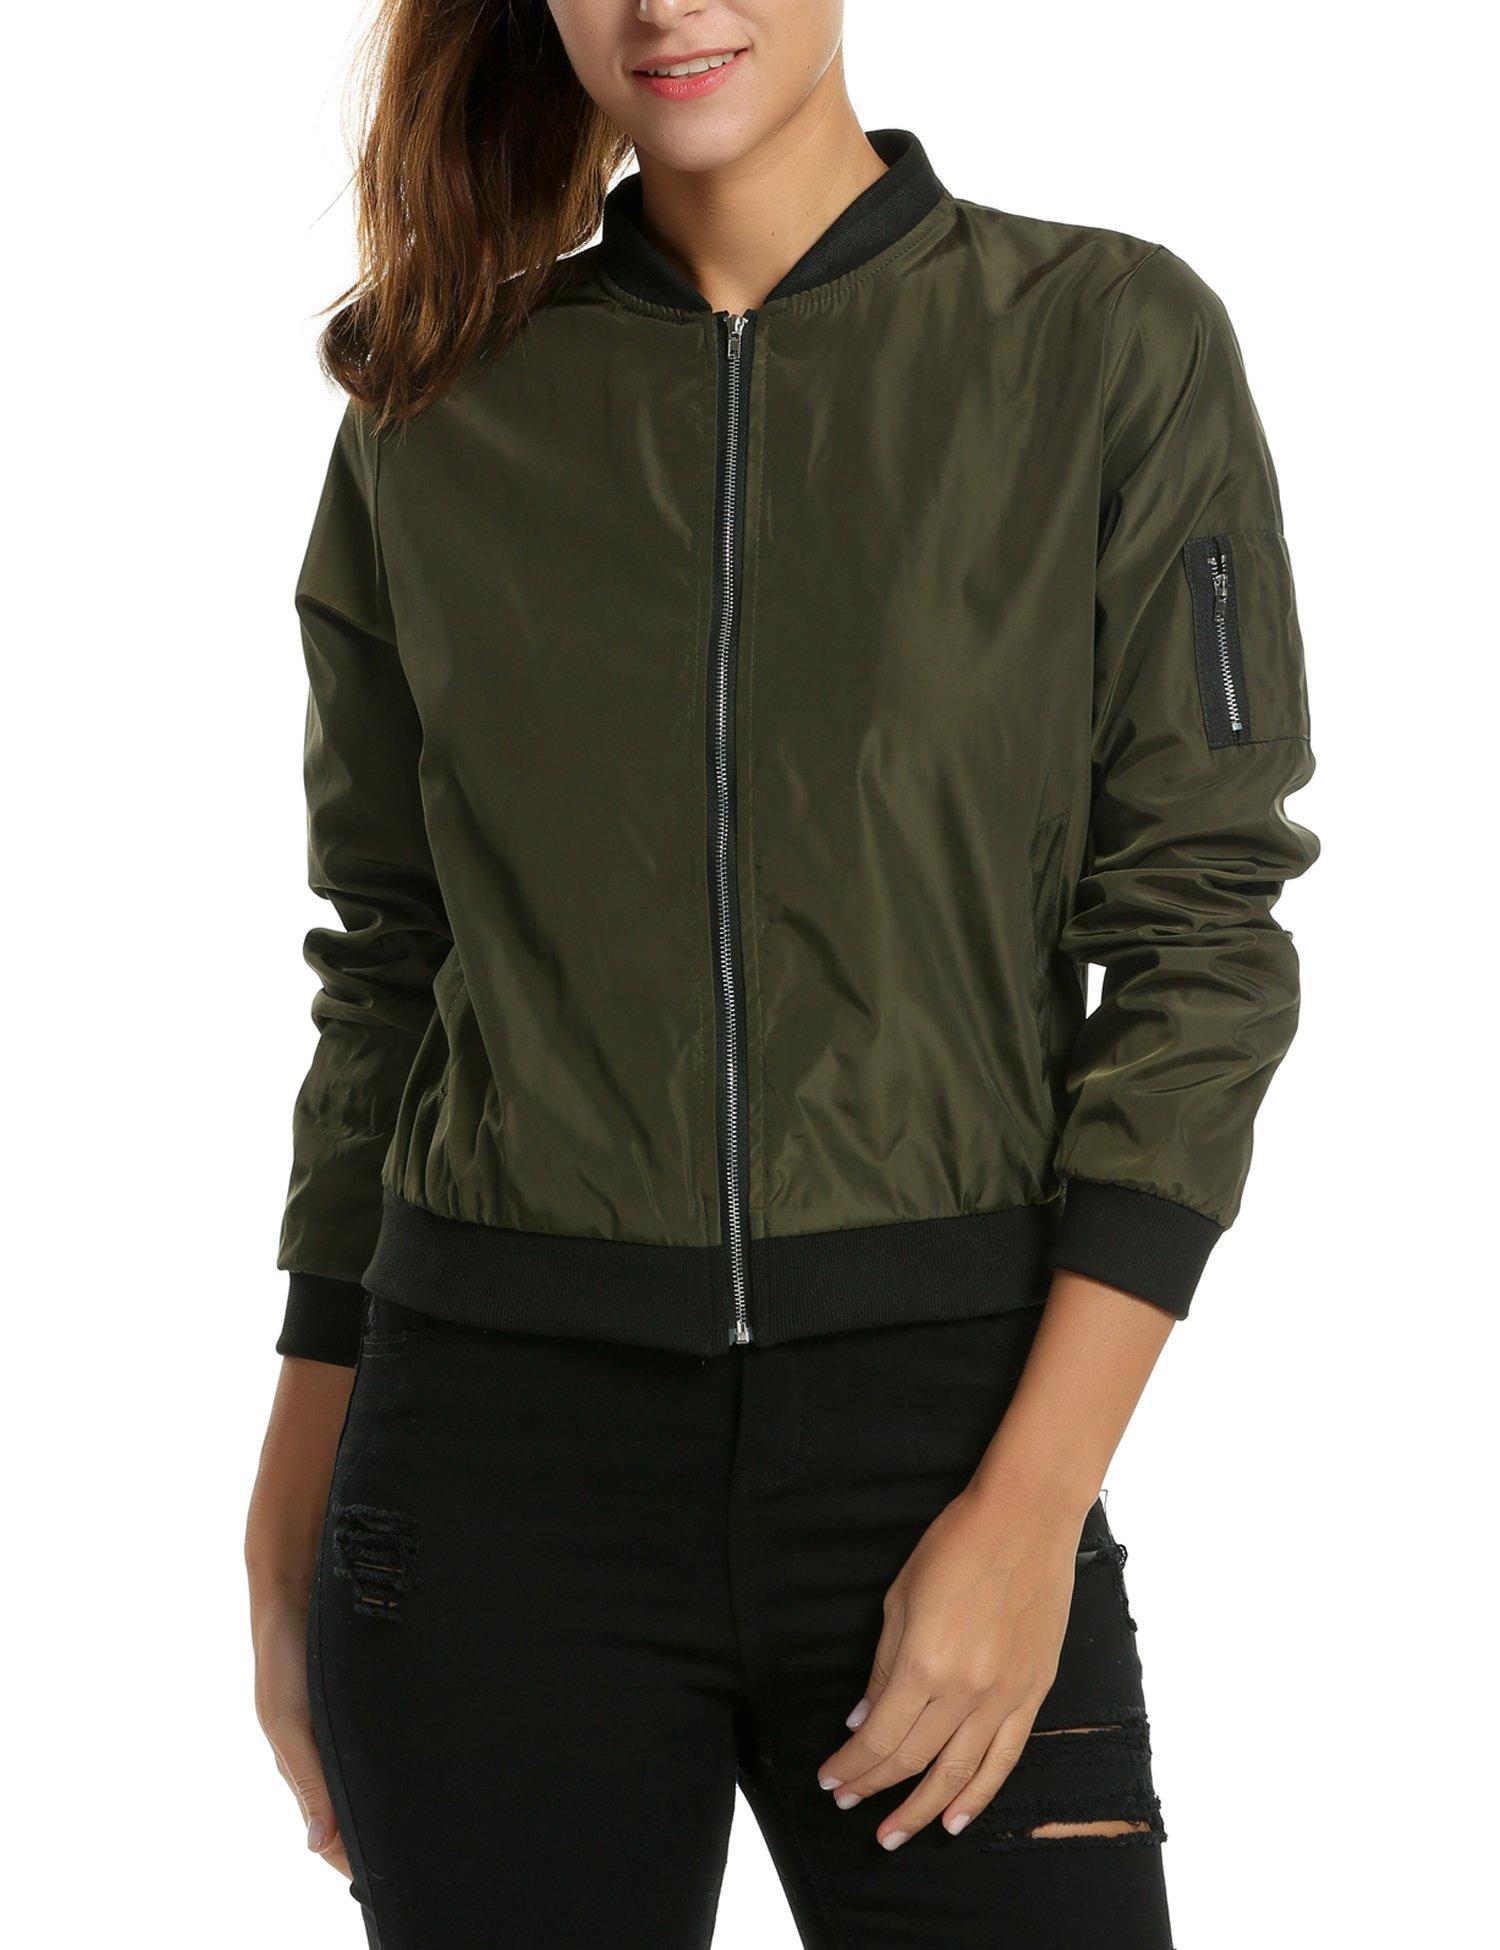 Zeagoo Womens Classic Quilted Jacket Short Bomber Jacket Coat, # Army Green, Medium, # Army Green, Medium by Zeagoo